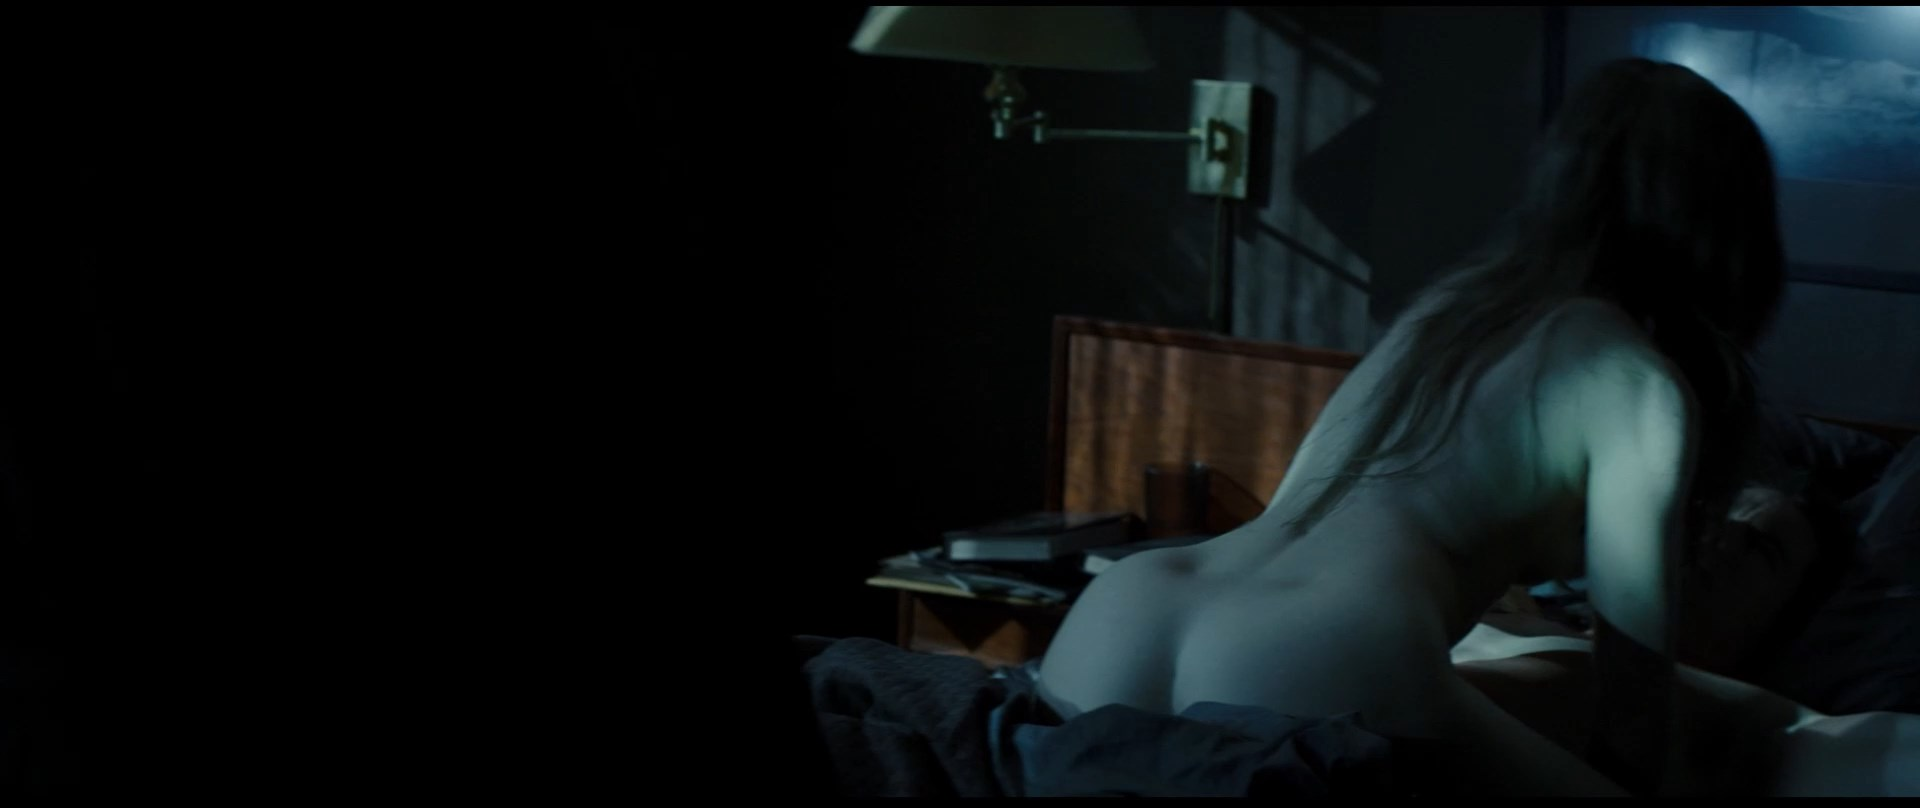 Heather rene smith tits